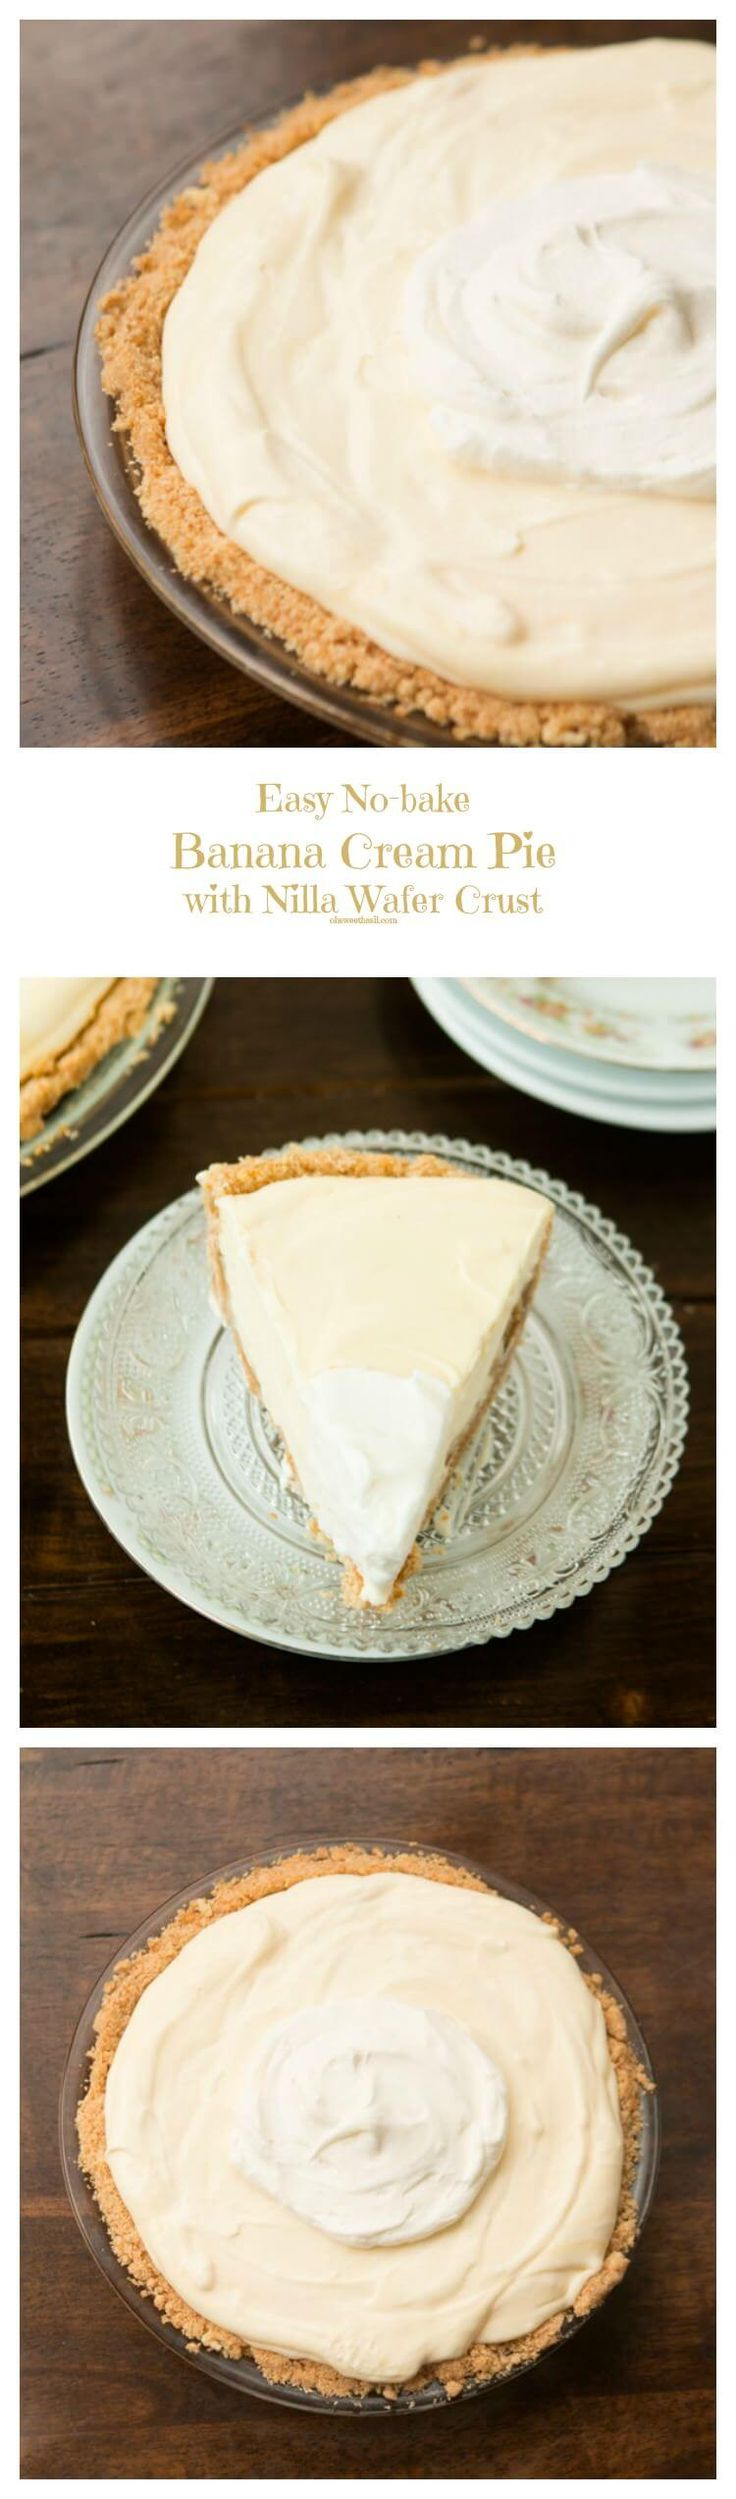 Easy No Bake Banana Cream Pie with Nilla Wafer Crust ohsweetbasil.com